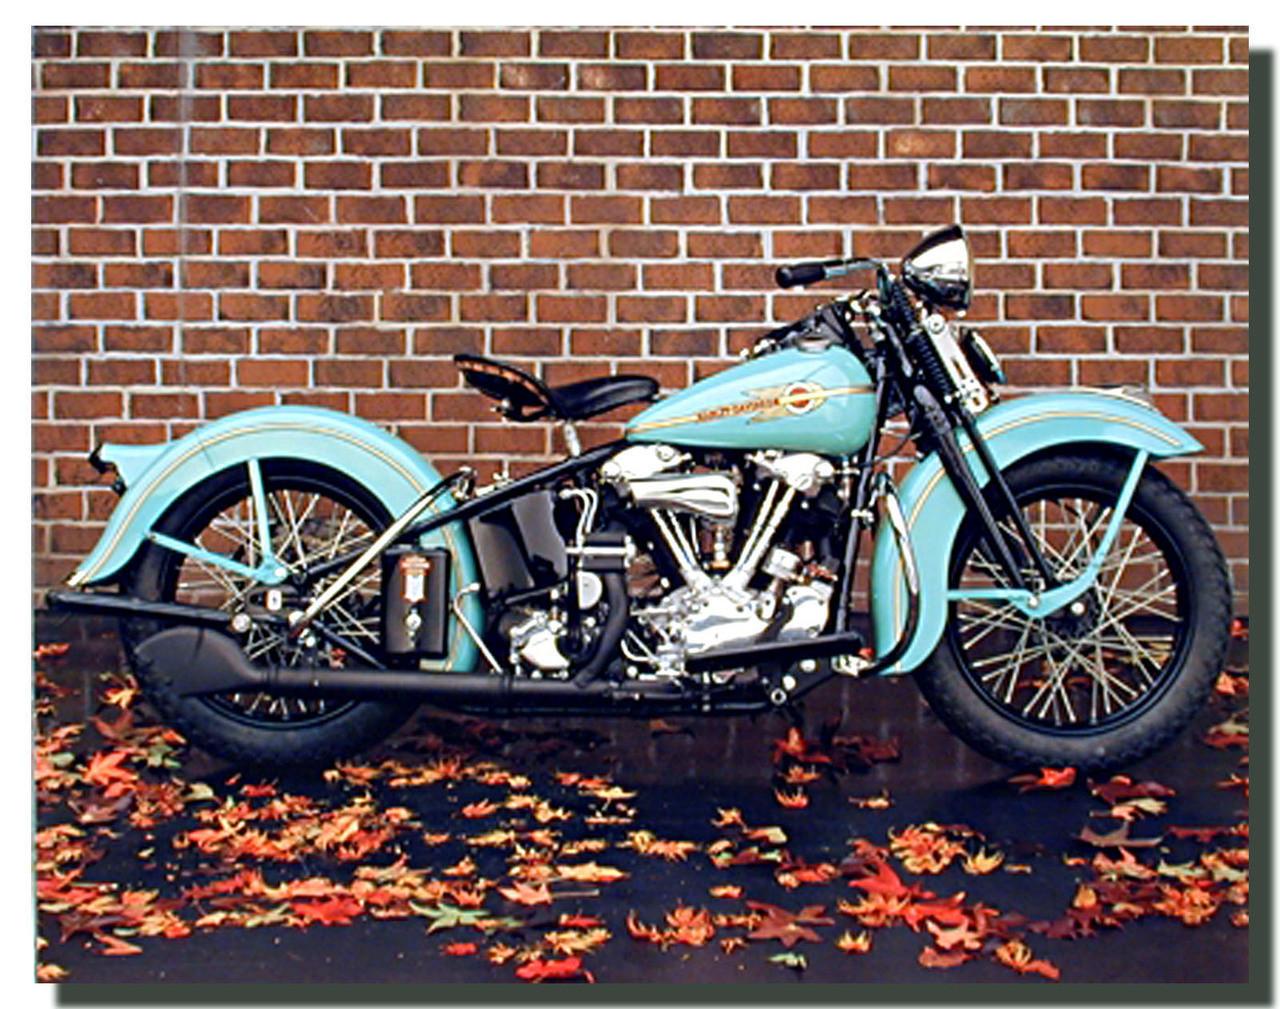 Aqua Harley Davidson Motorcycle Poster Motorcycle Posters